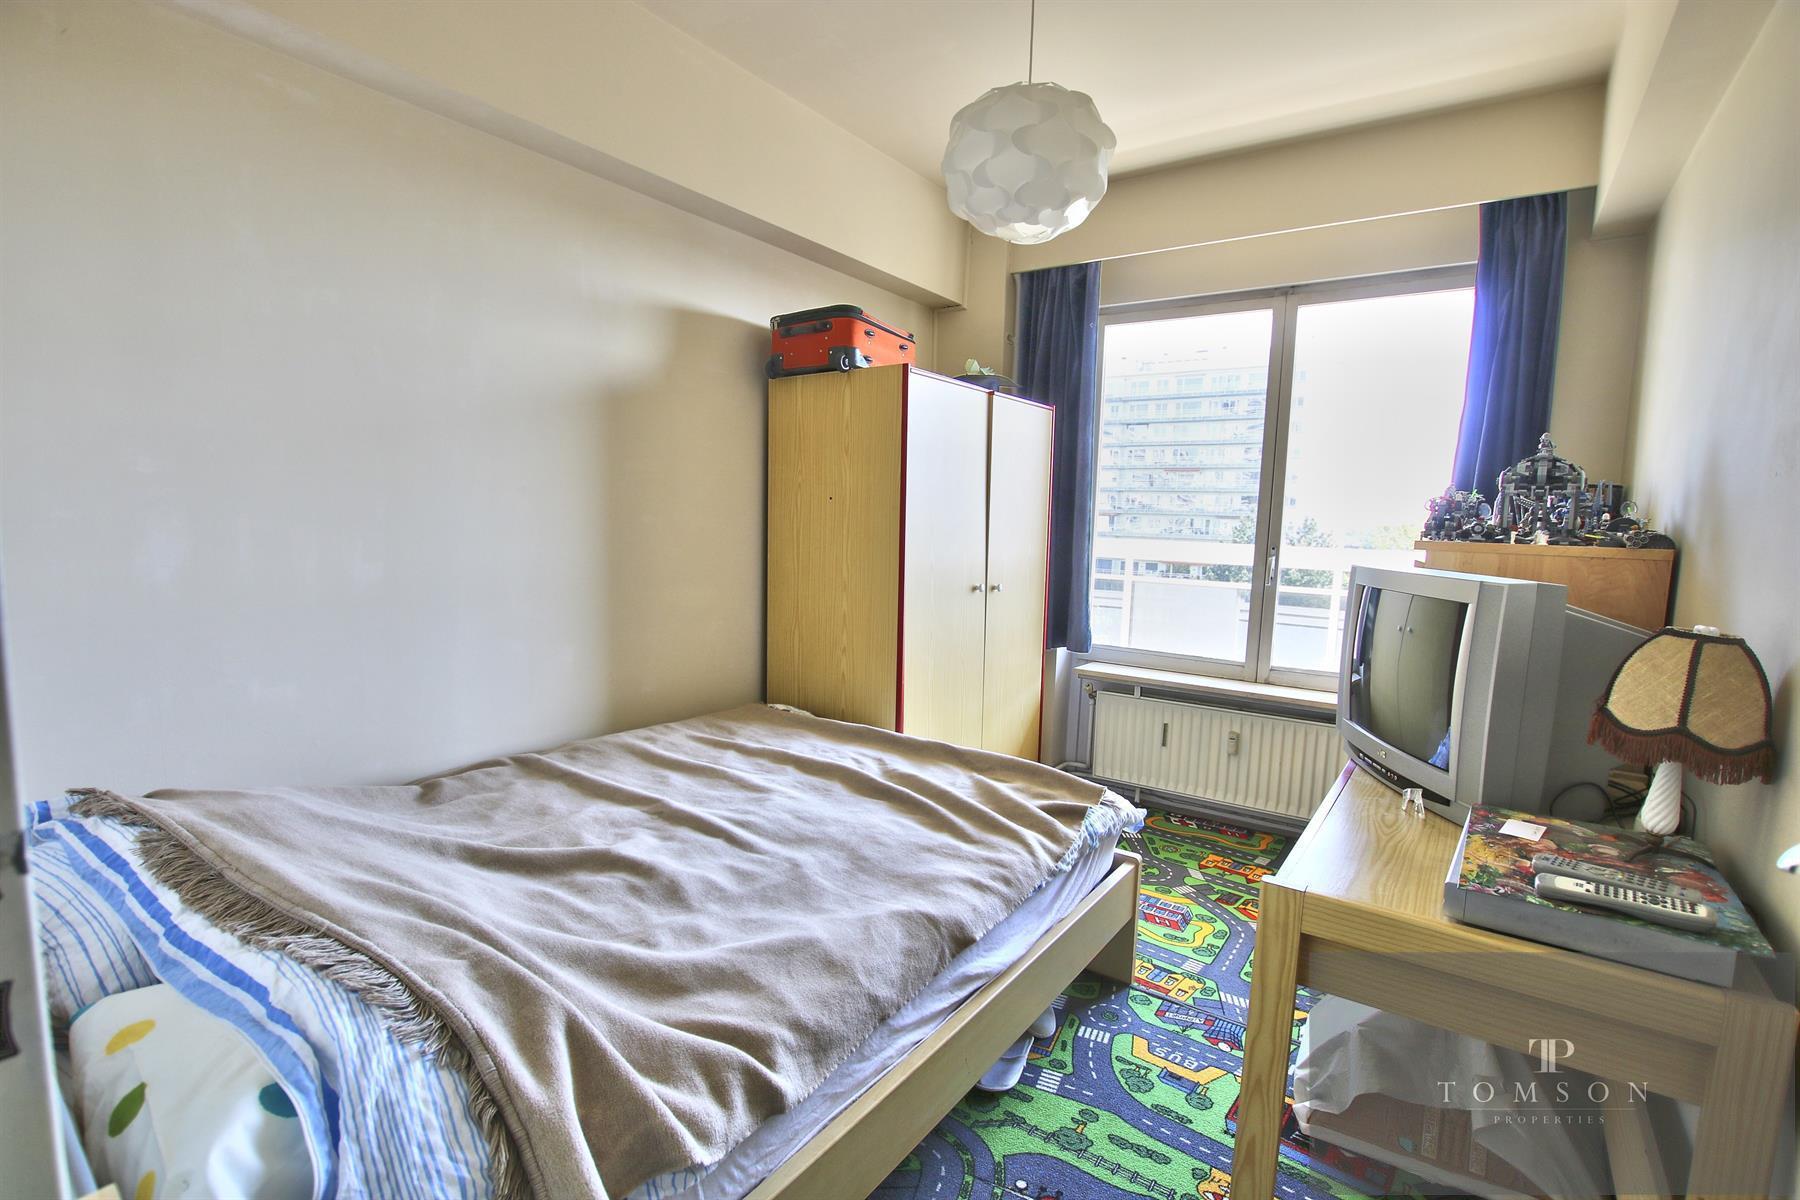 Appartement - Woluwe-Saint-Lambert - #4103299-4